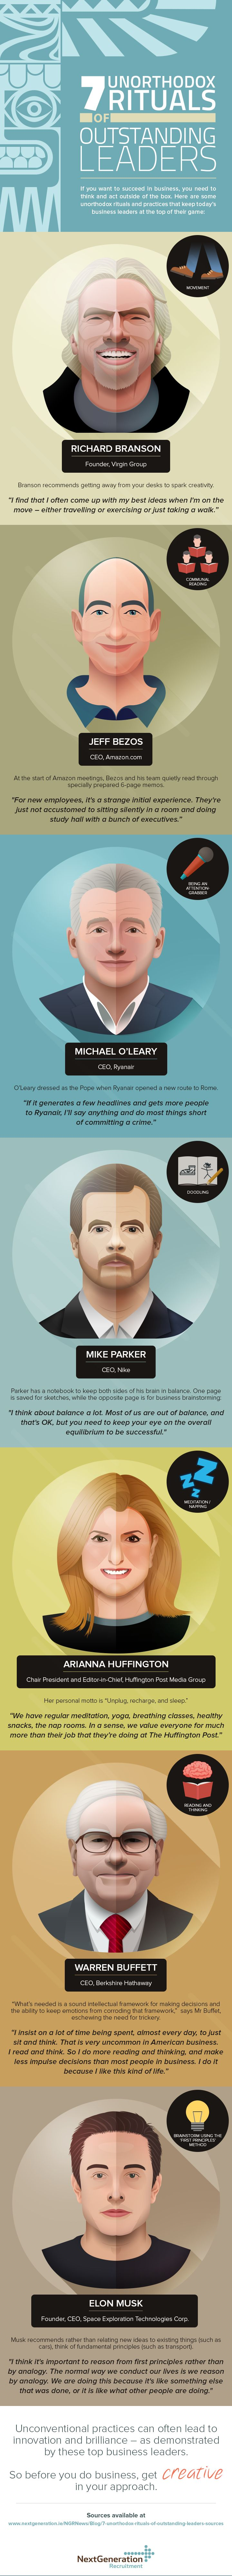 Unique Infographic Design, 7 Unorthodox Rituals Outstanding Leaders via @hazelpugh #Infographic #Design #Entrepreneur